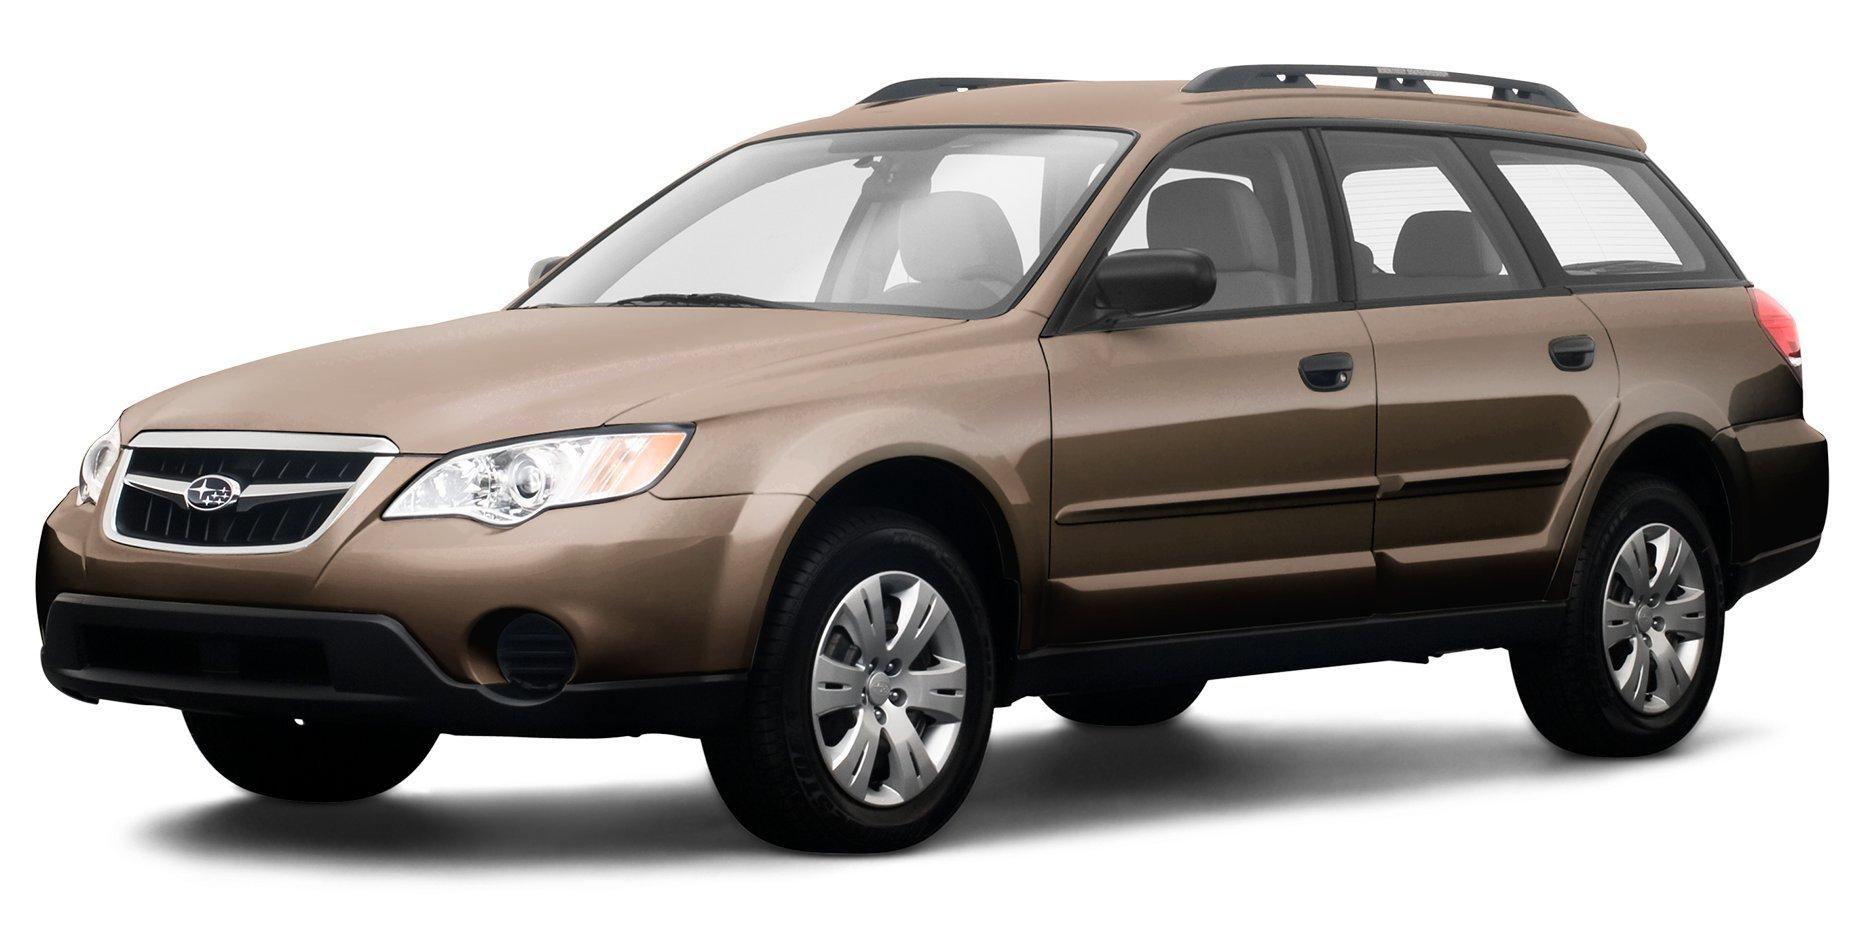 2009 Subaru Outback | Pricing, Ratings & Reviews | Kelley ... |2009 Subaru Outback